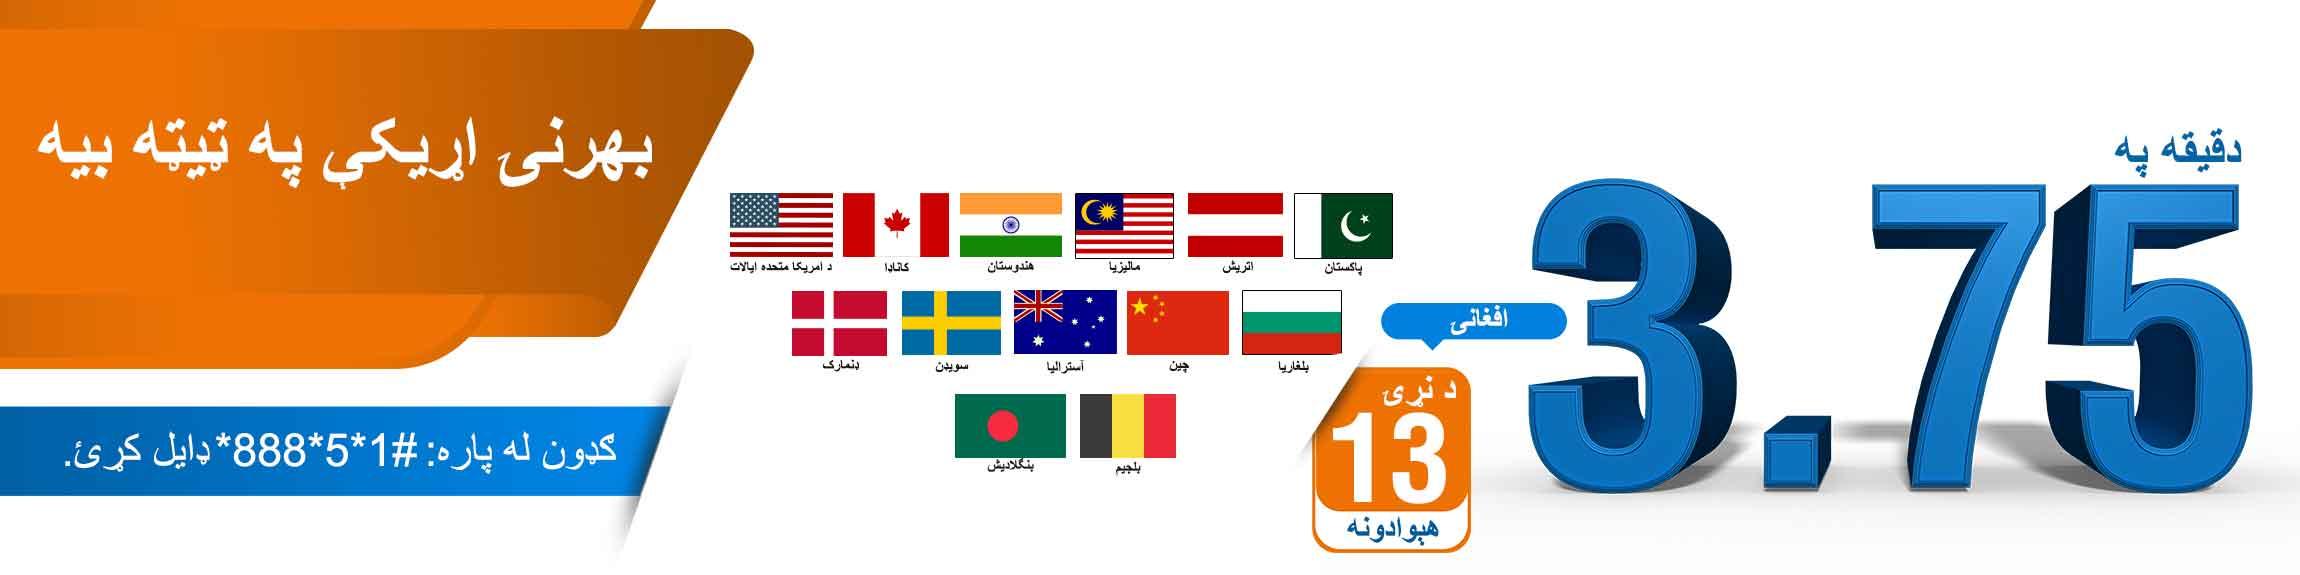 ild13-pashto-website